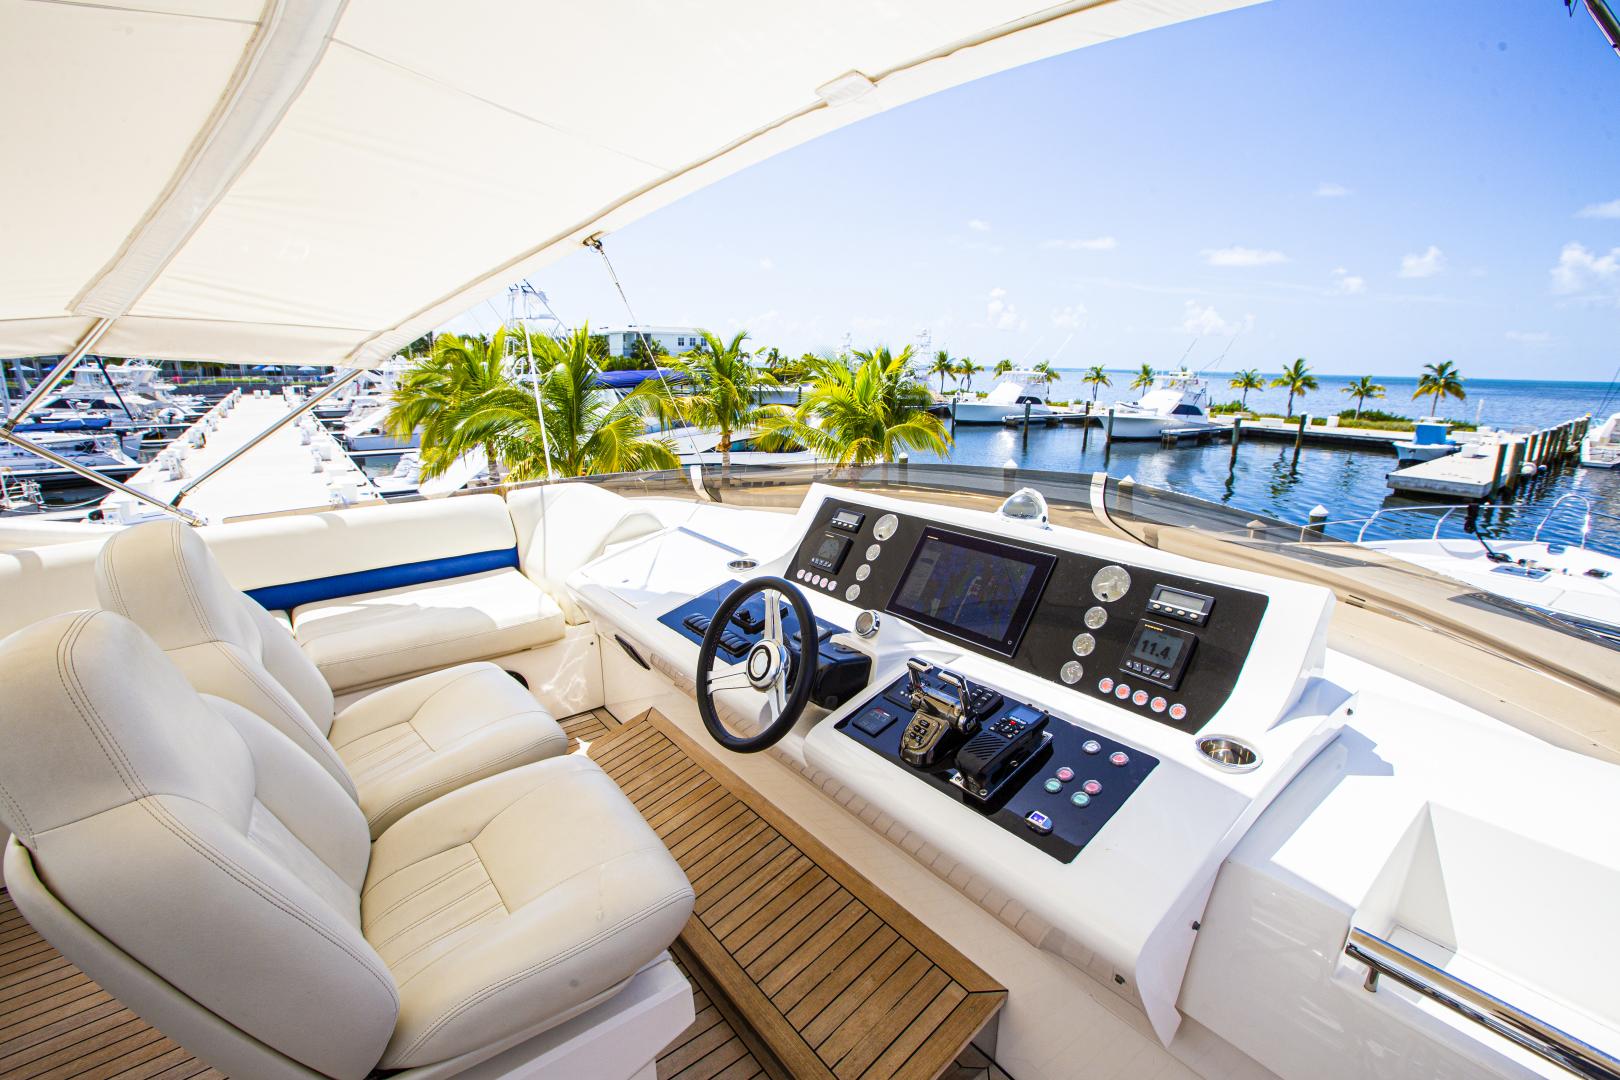 Viking Princess-V85 2009-Las Brisas Fort Lauderdale-Florida-United States-1365536 | Thumbnail